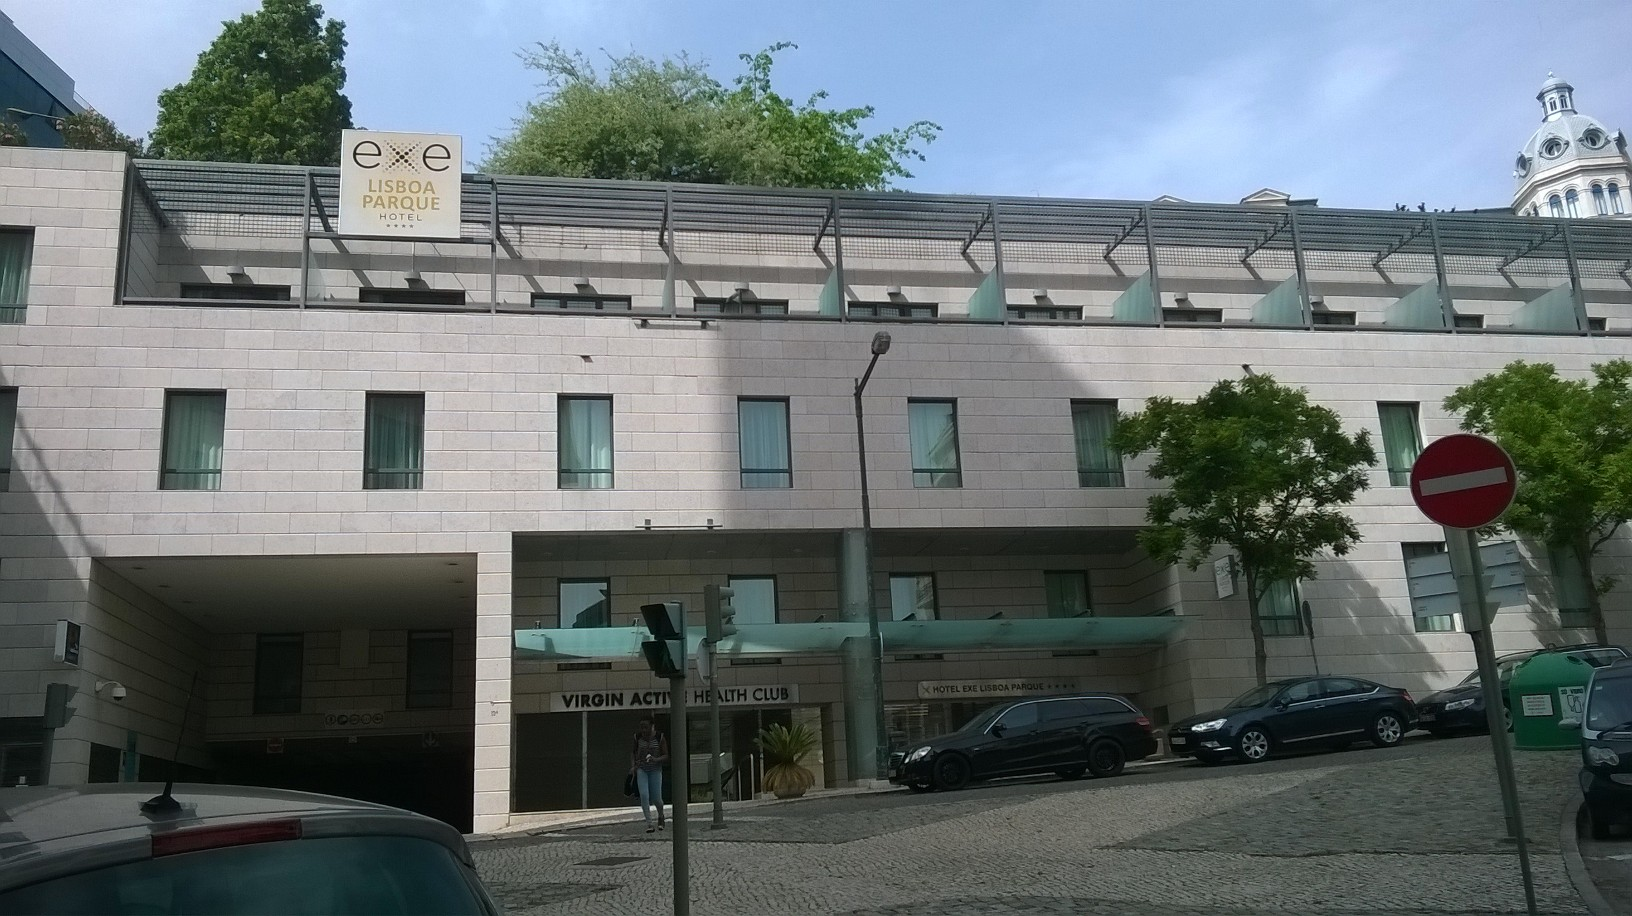 lisbon-exe-hotel-arriving-my15